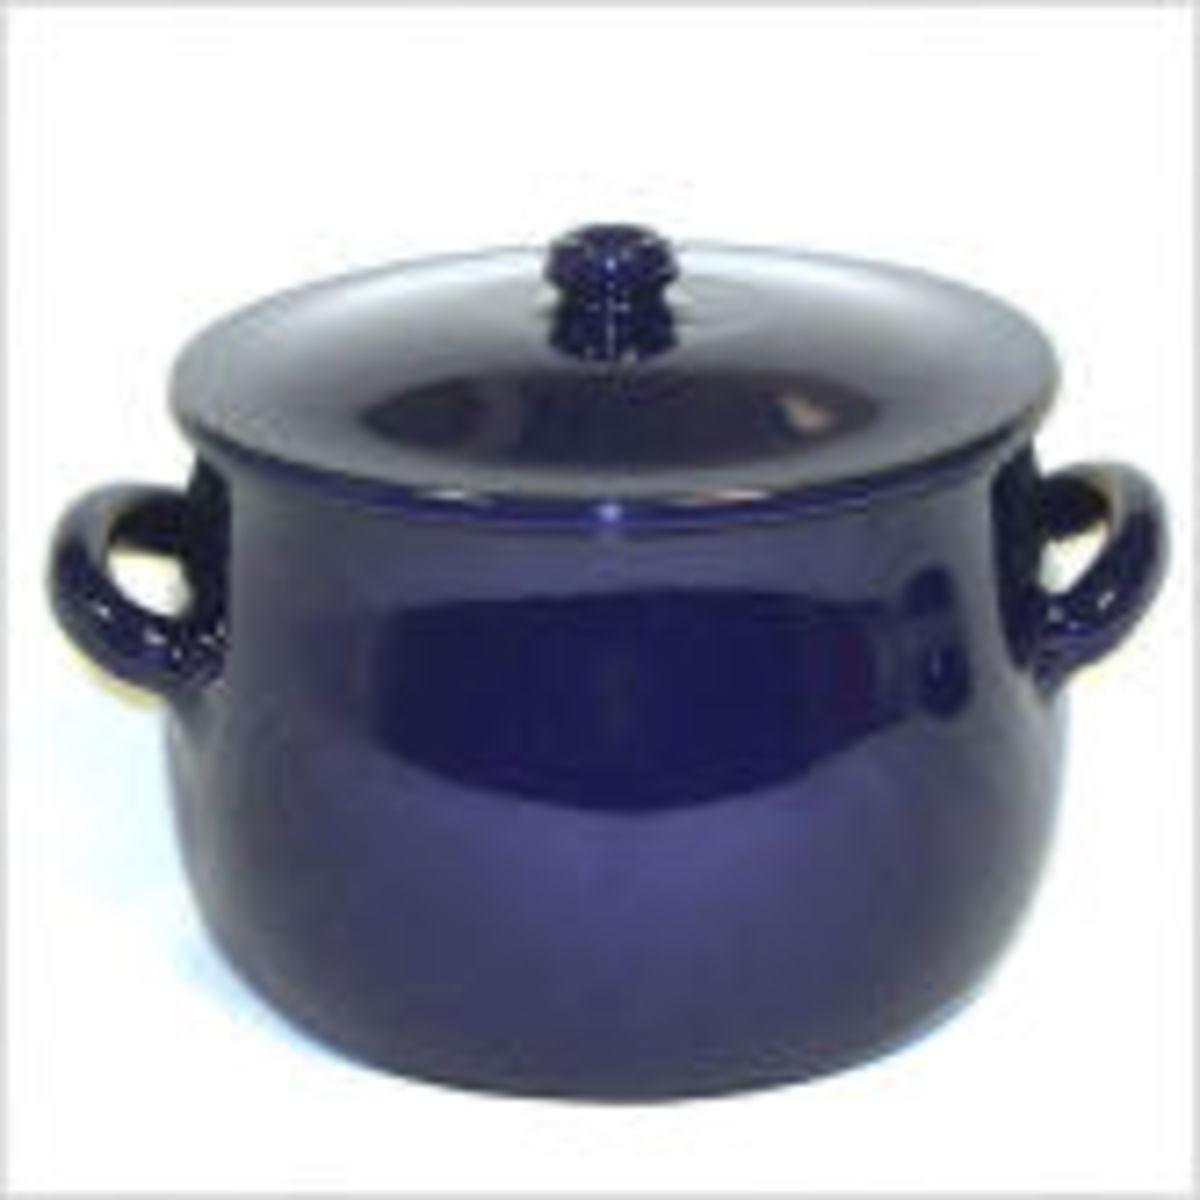 piral-italian-terracota-cookware-the-wow-factors